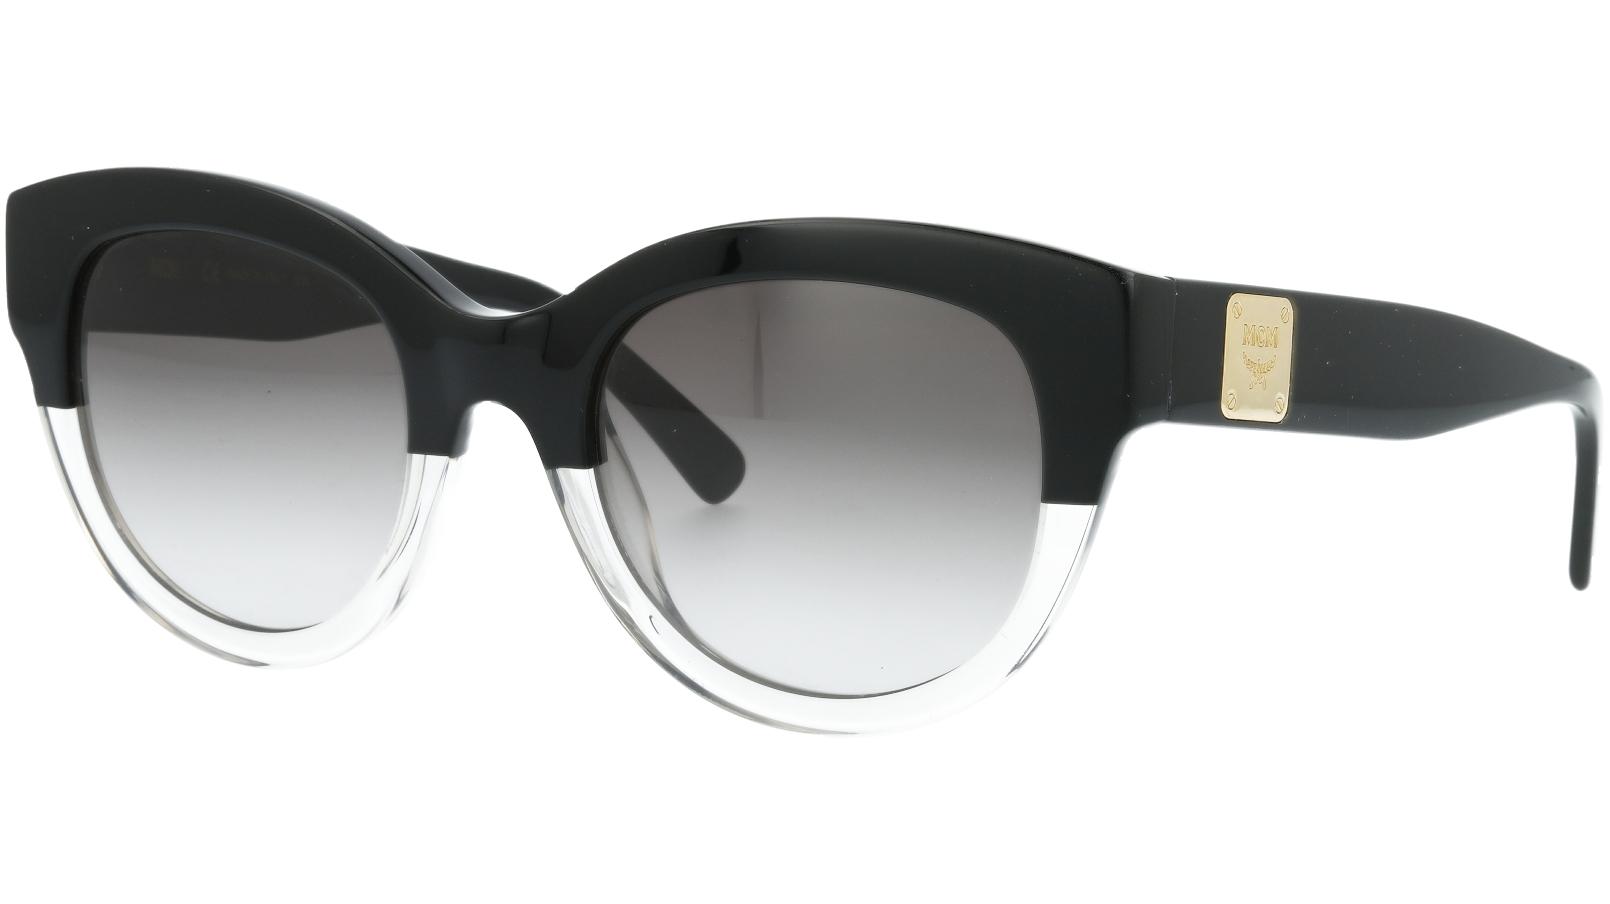 MCM MCM608S 003 53 BLACK Sunglasses